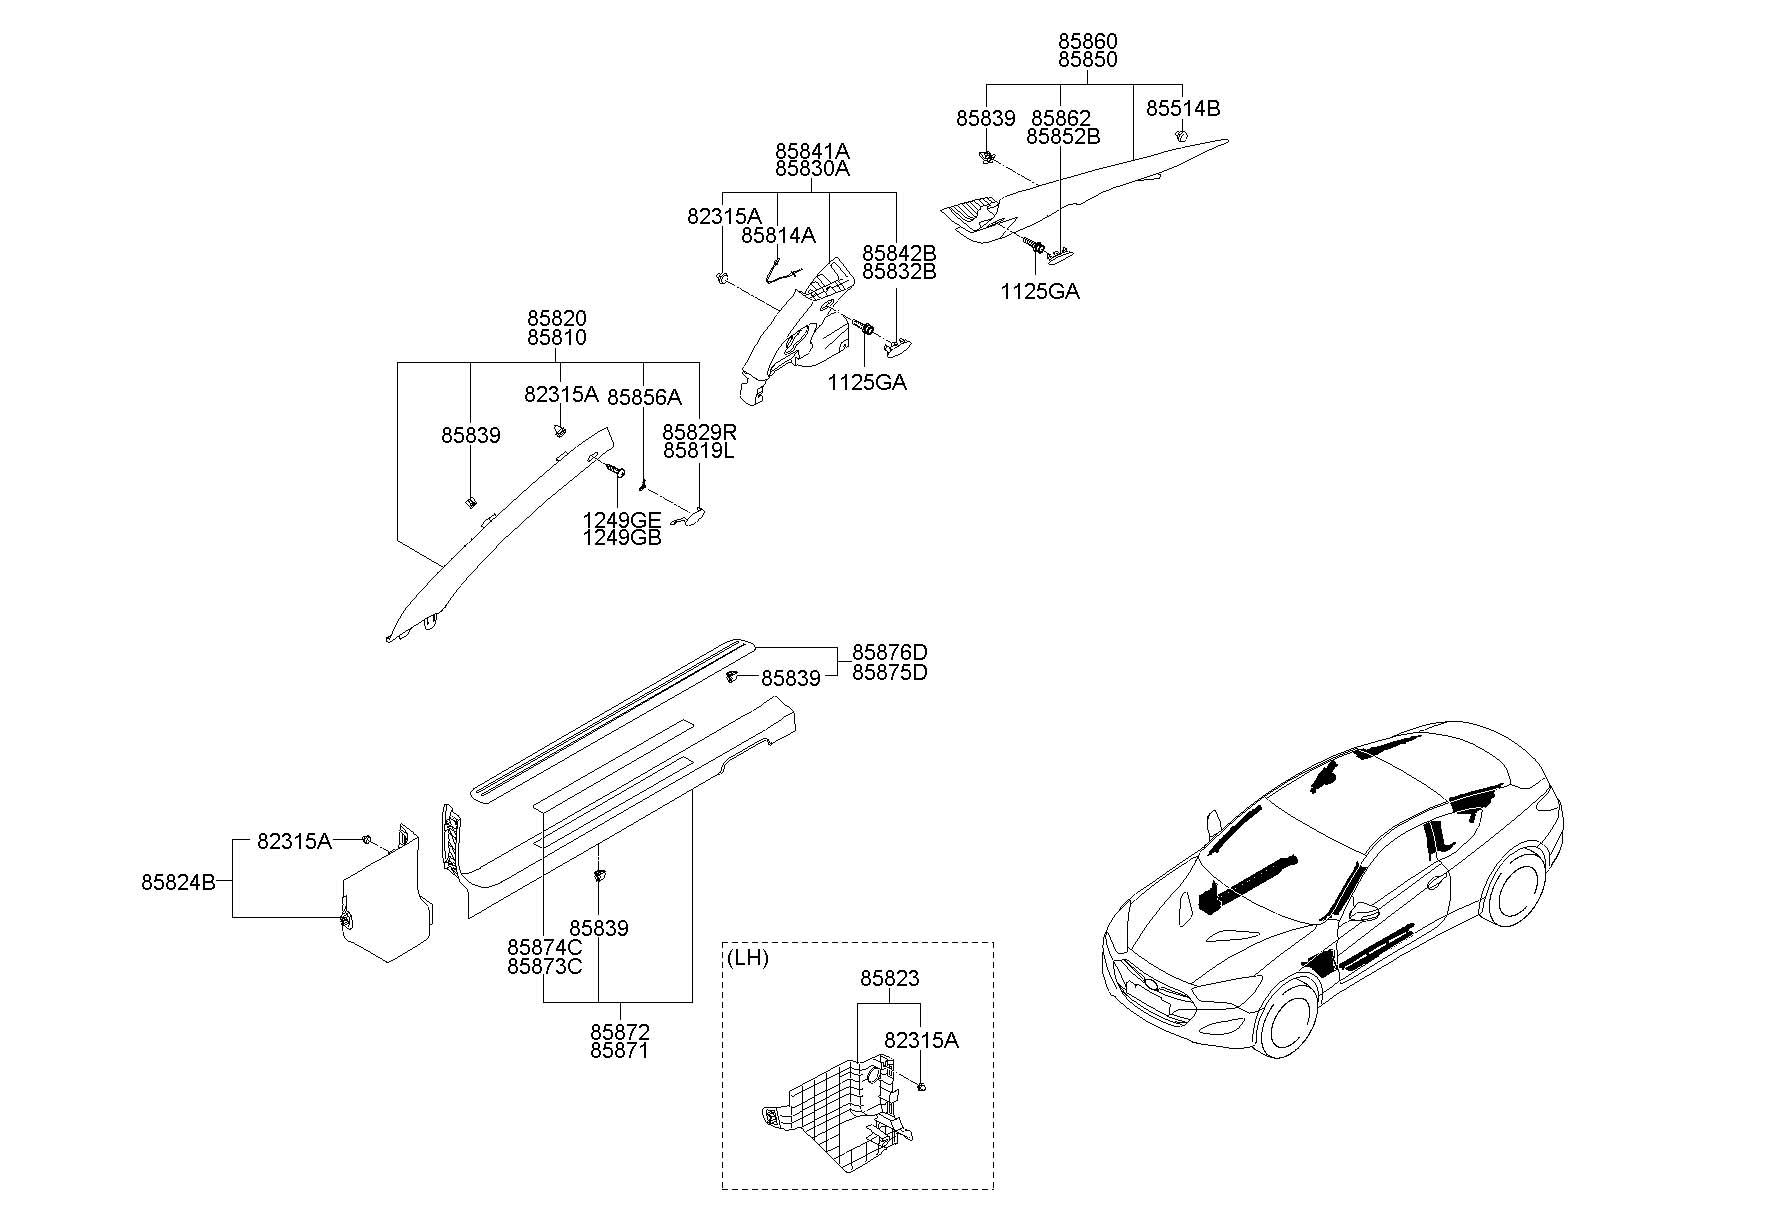 2010 hyundai azera interior wiring diagram database. Black Bedroom Furniture Sets. Home Design Ideas